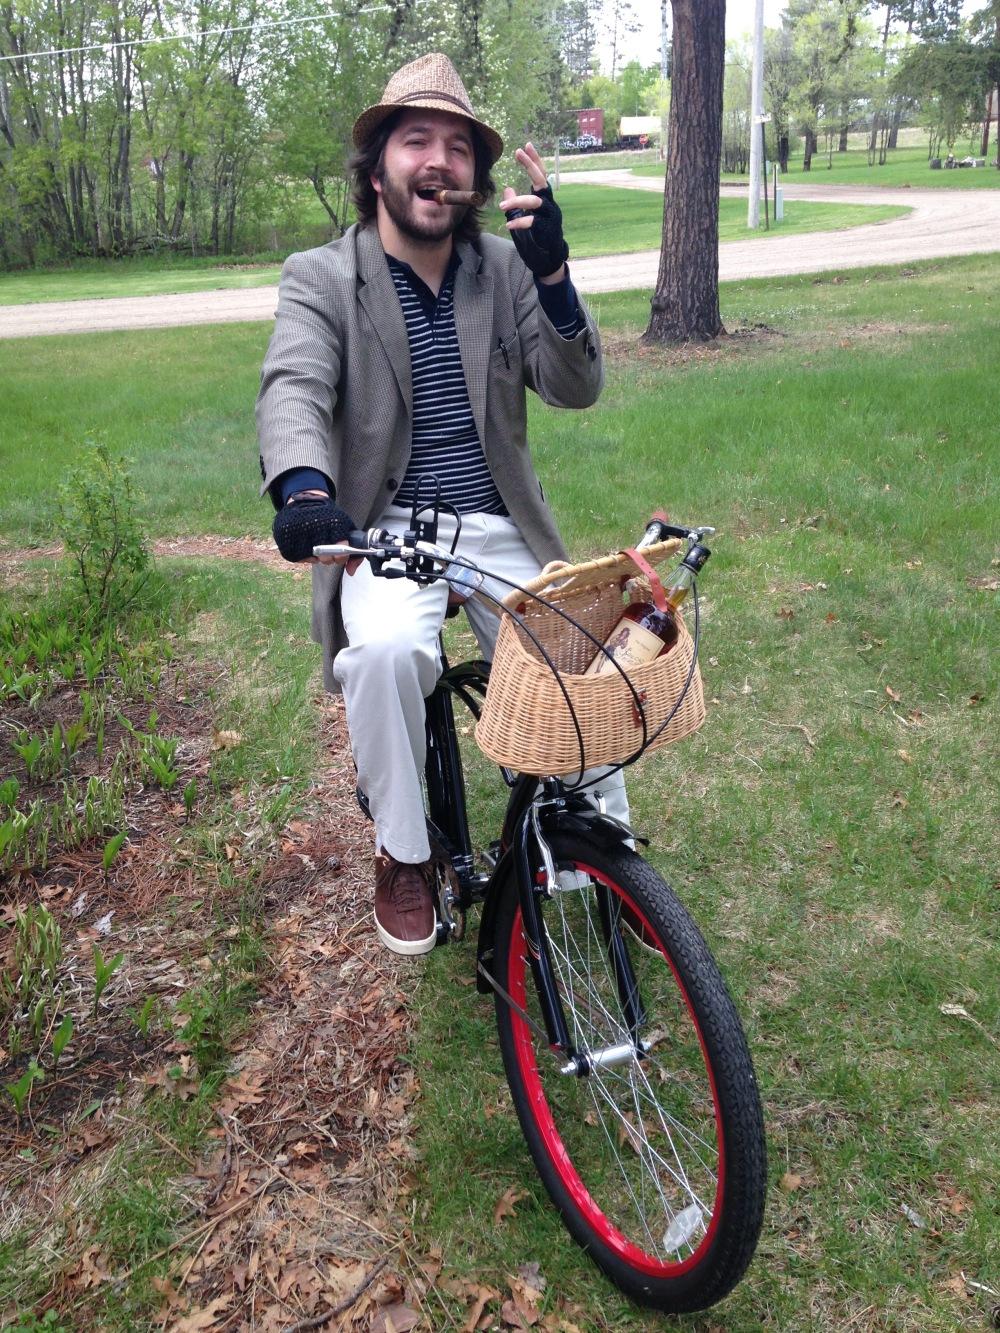 biking with style